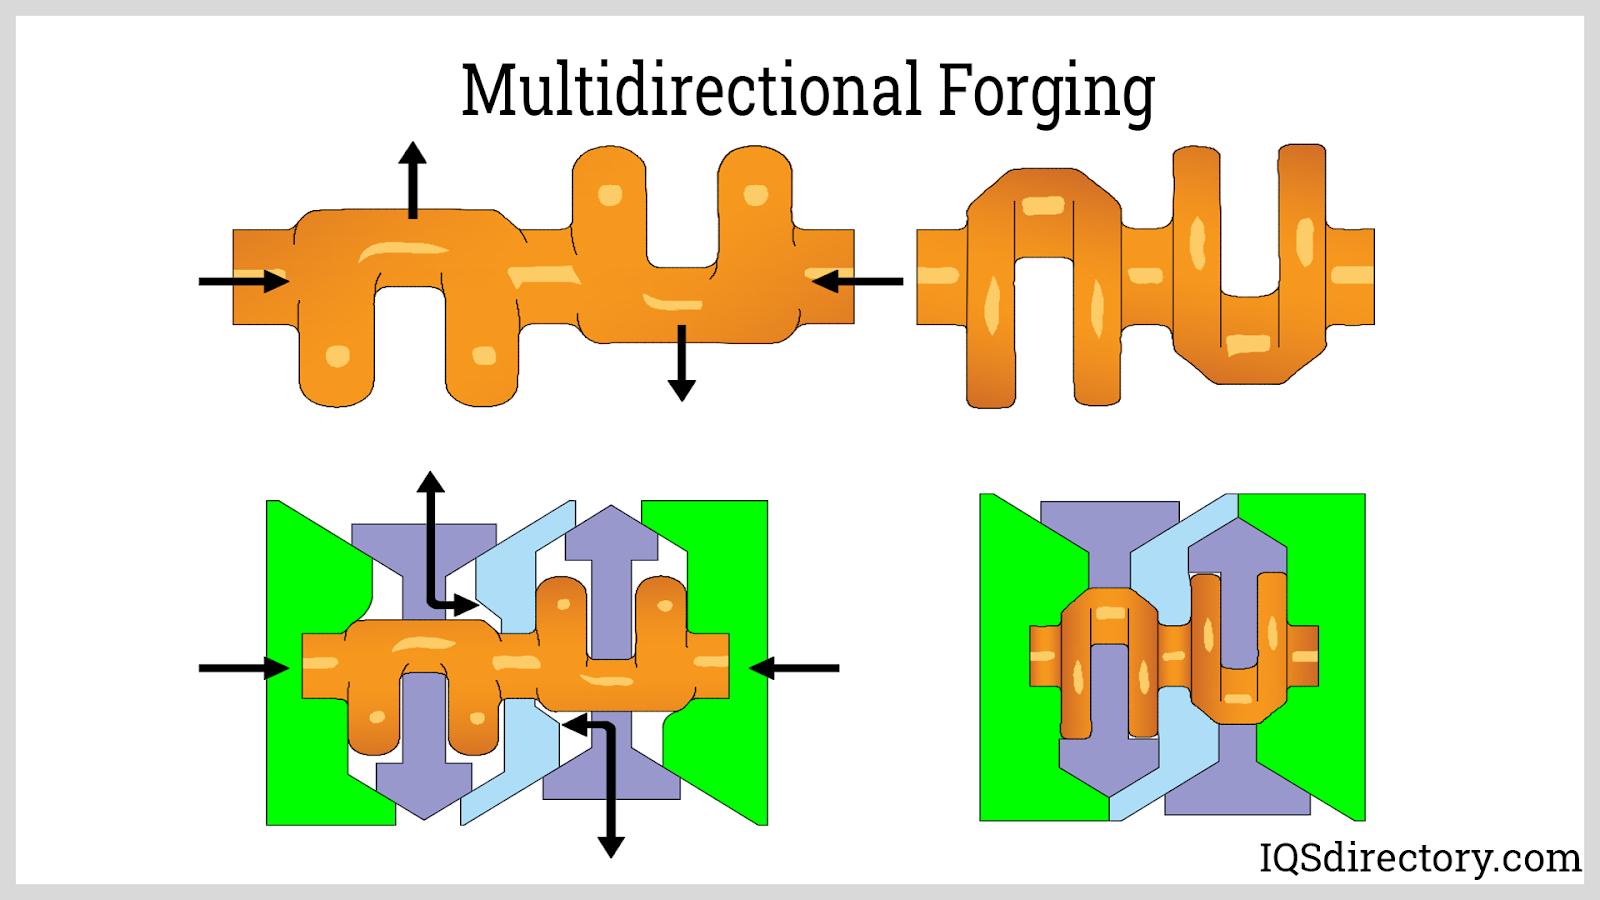 Multidirectional Forging